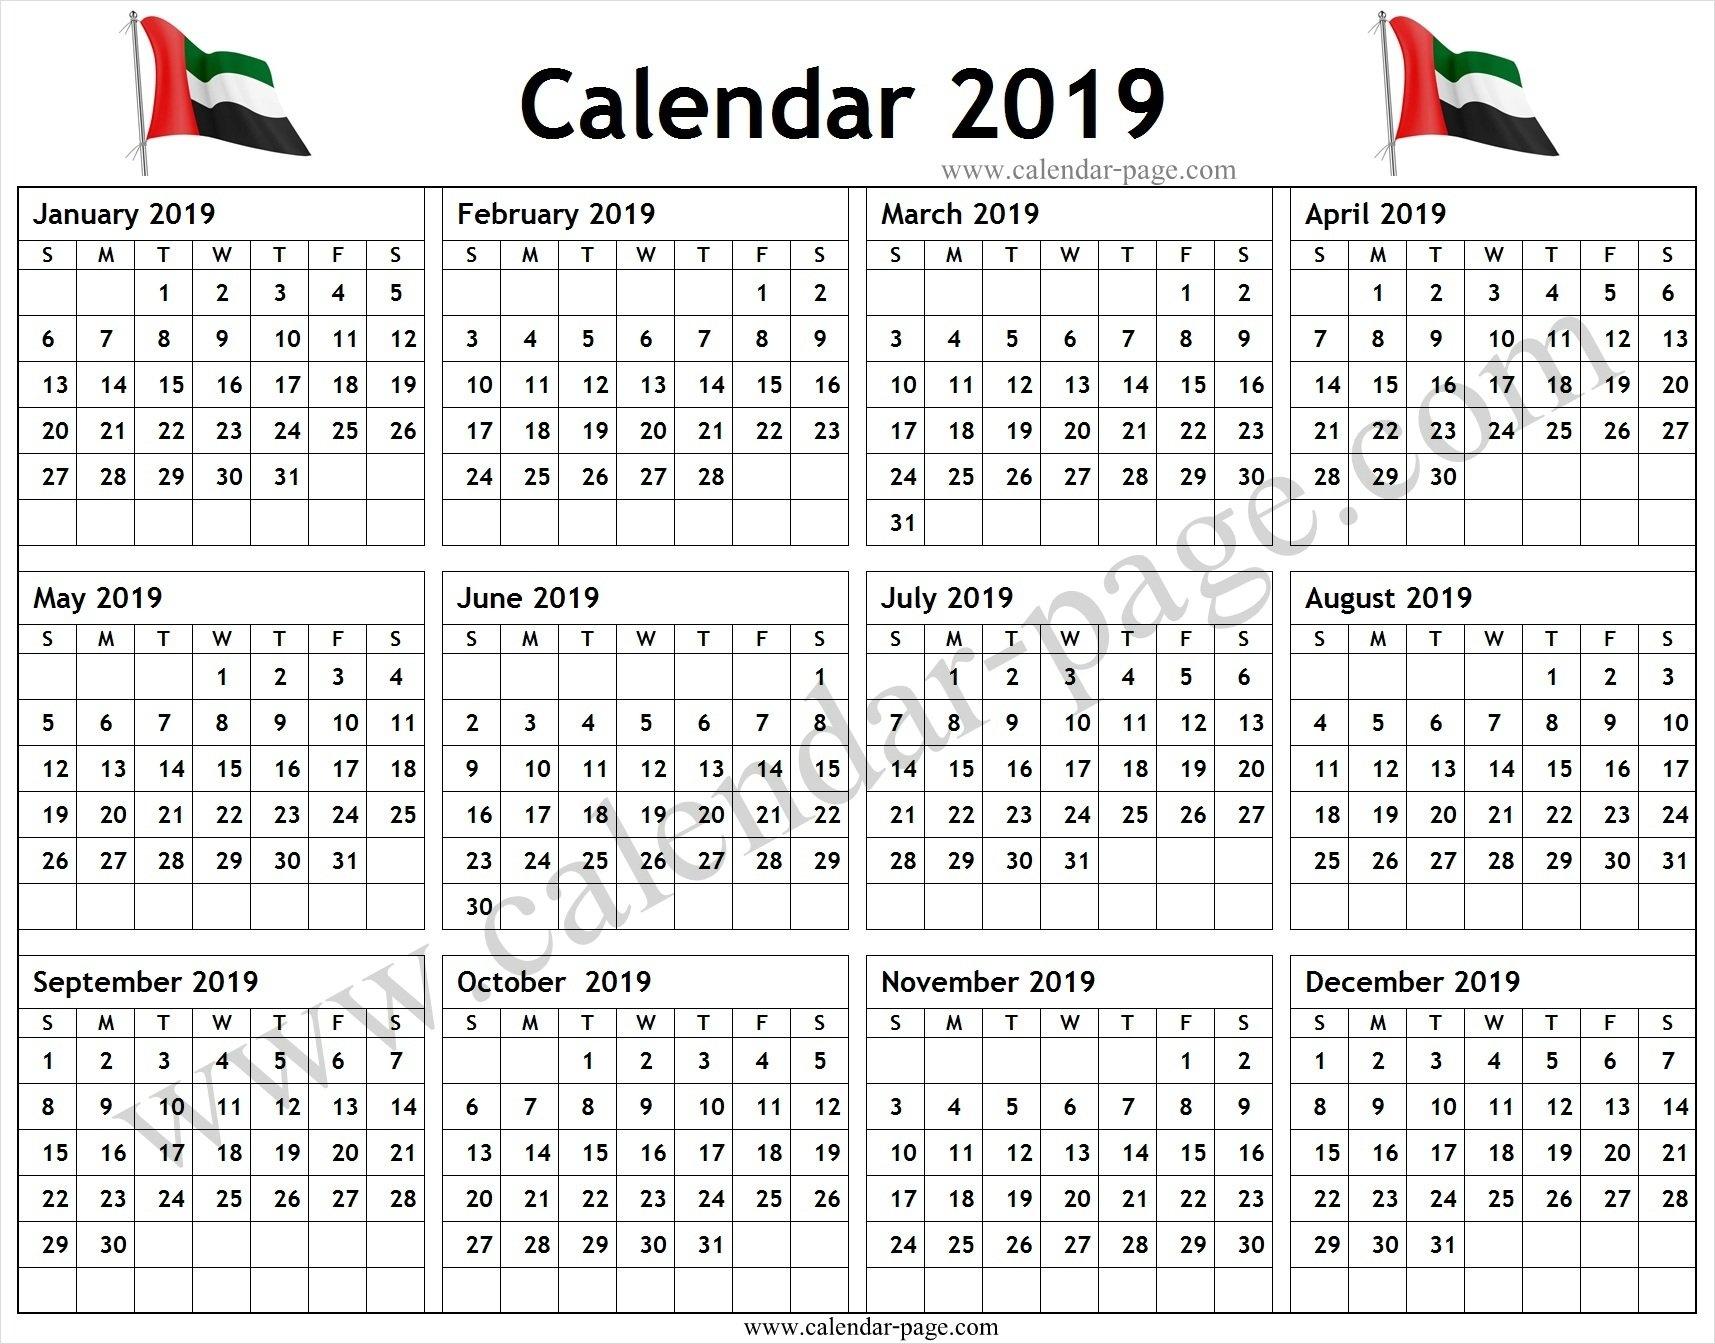 Calendar 2019 Uae Pdf - Blank Calendar 2019 Template U A E Calendar 2019